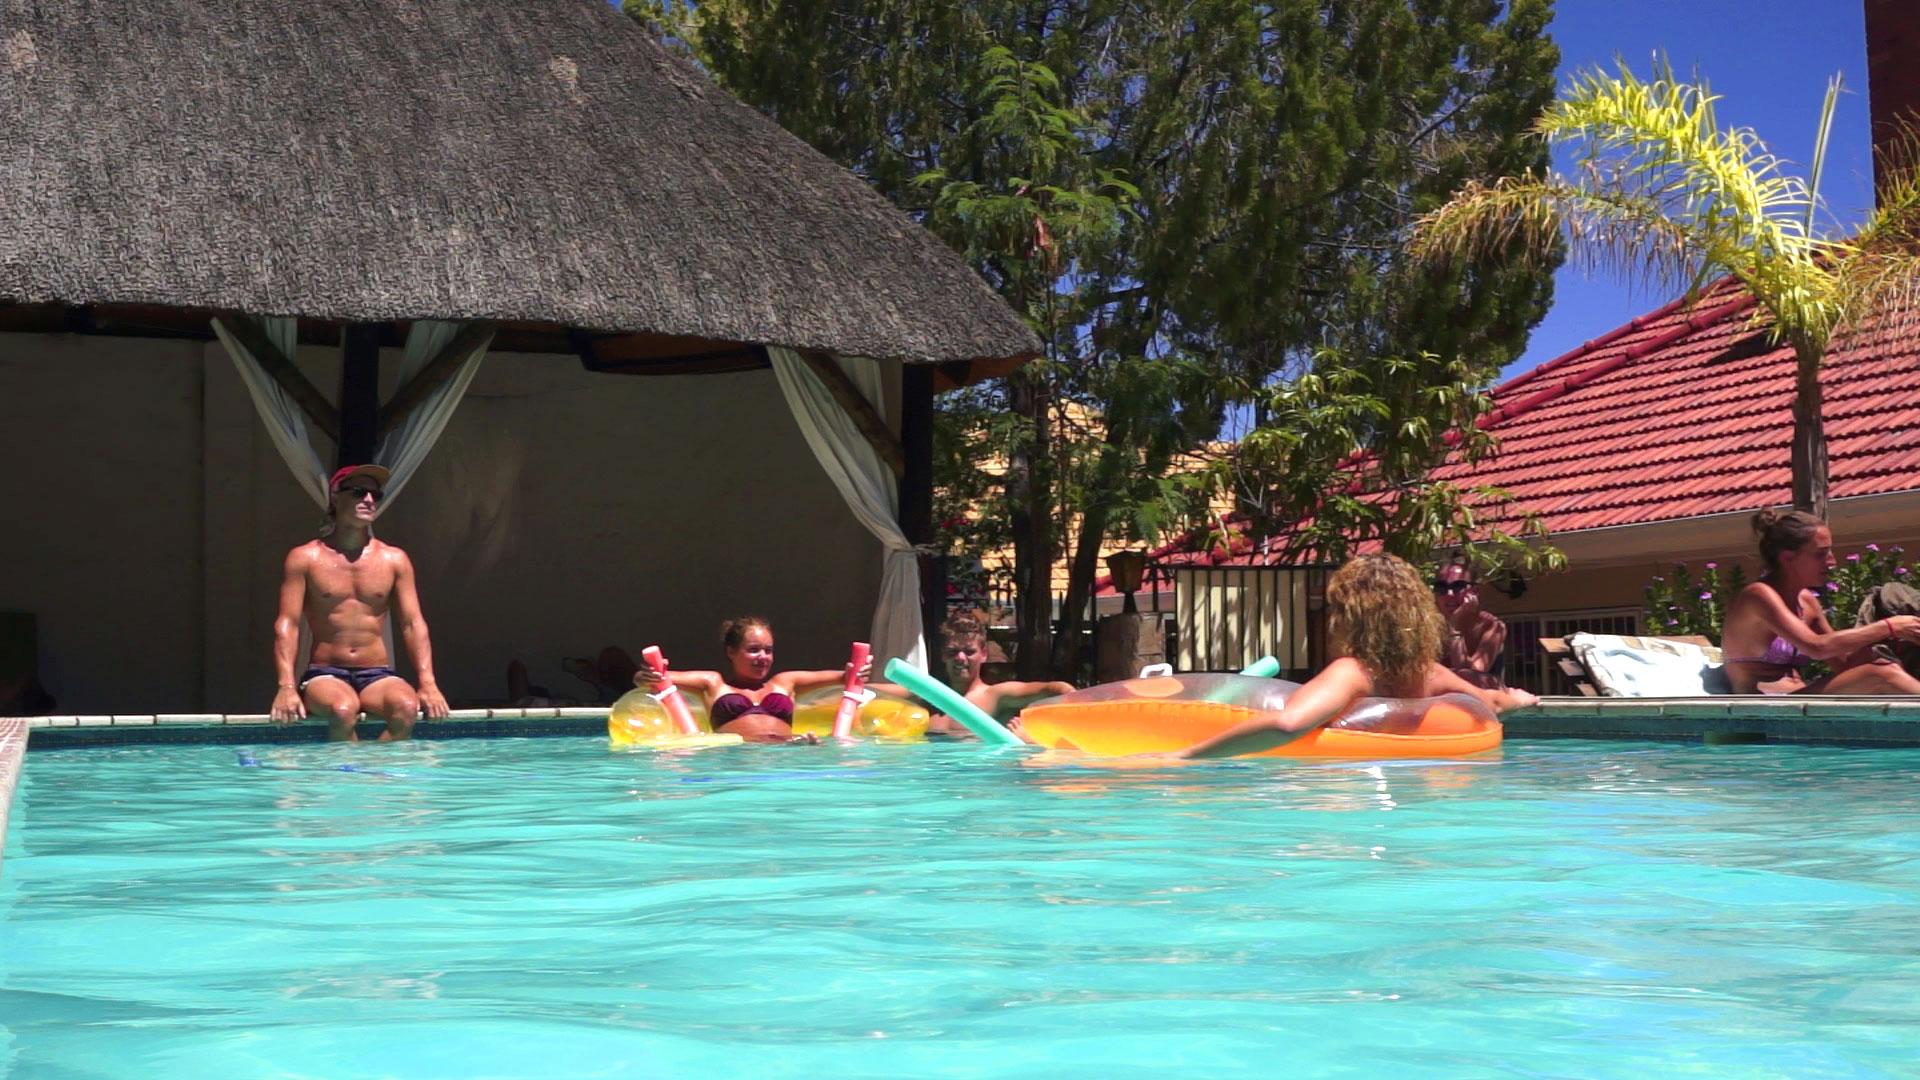 Paradisegarden backpackers hostel windhoek hostels namibia altavistaventures Choice Image